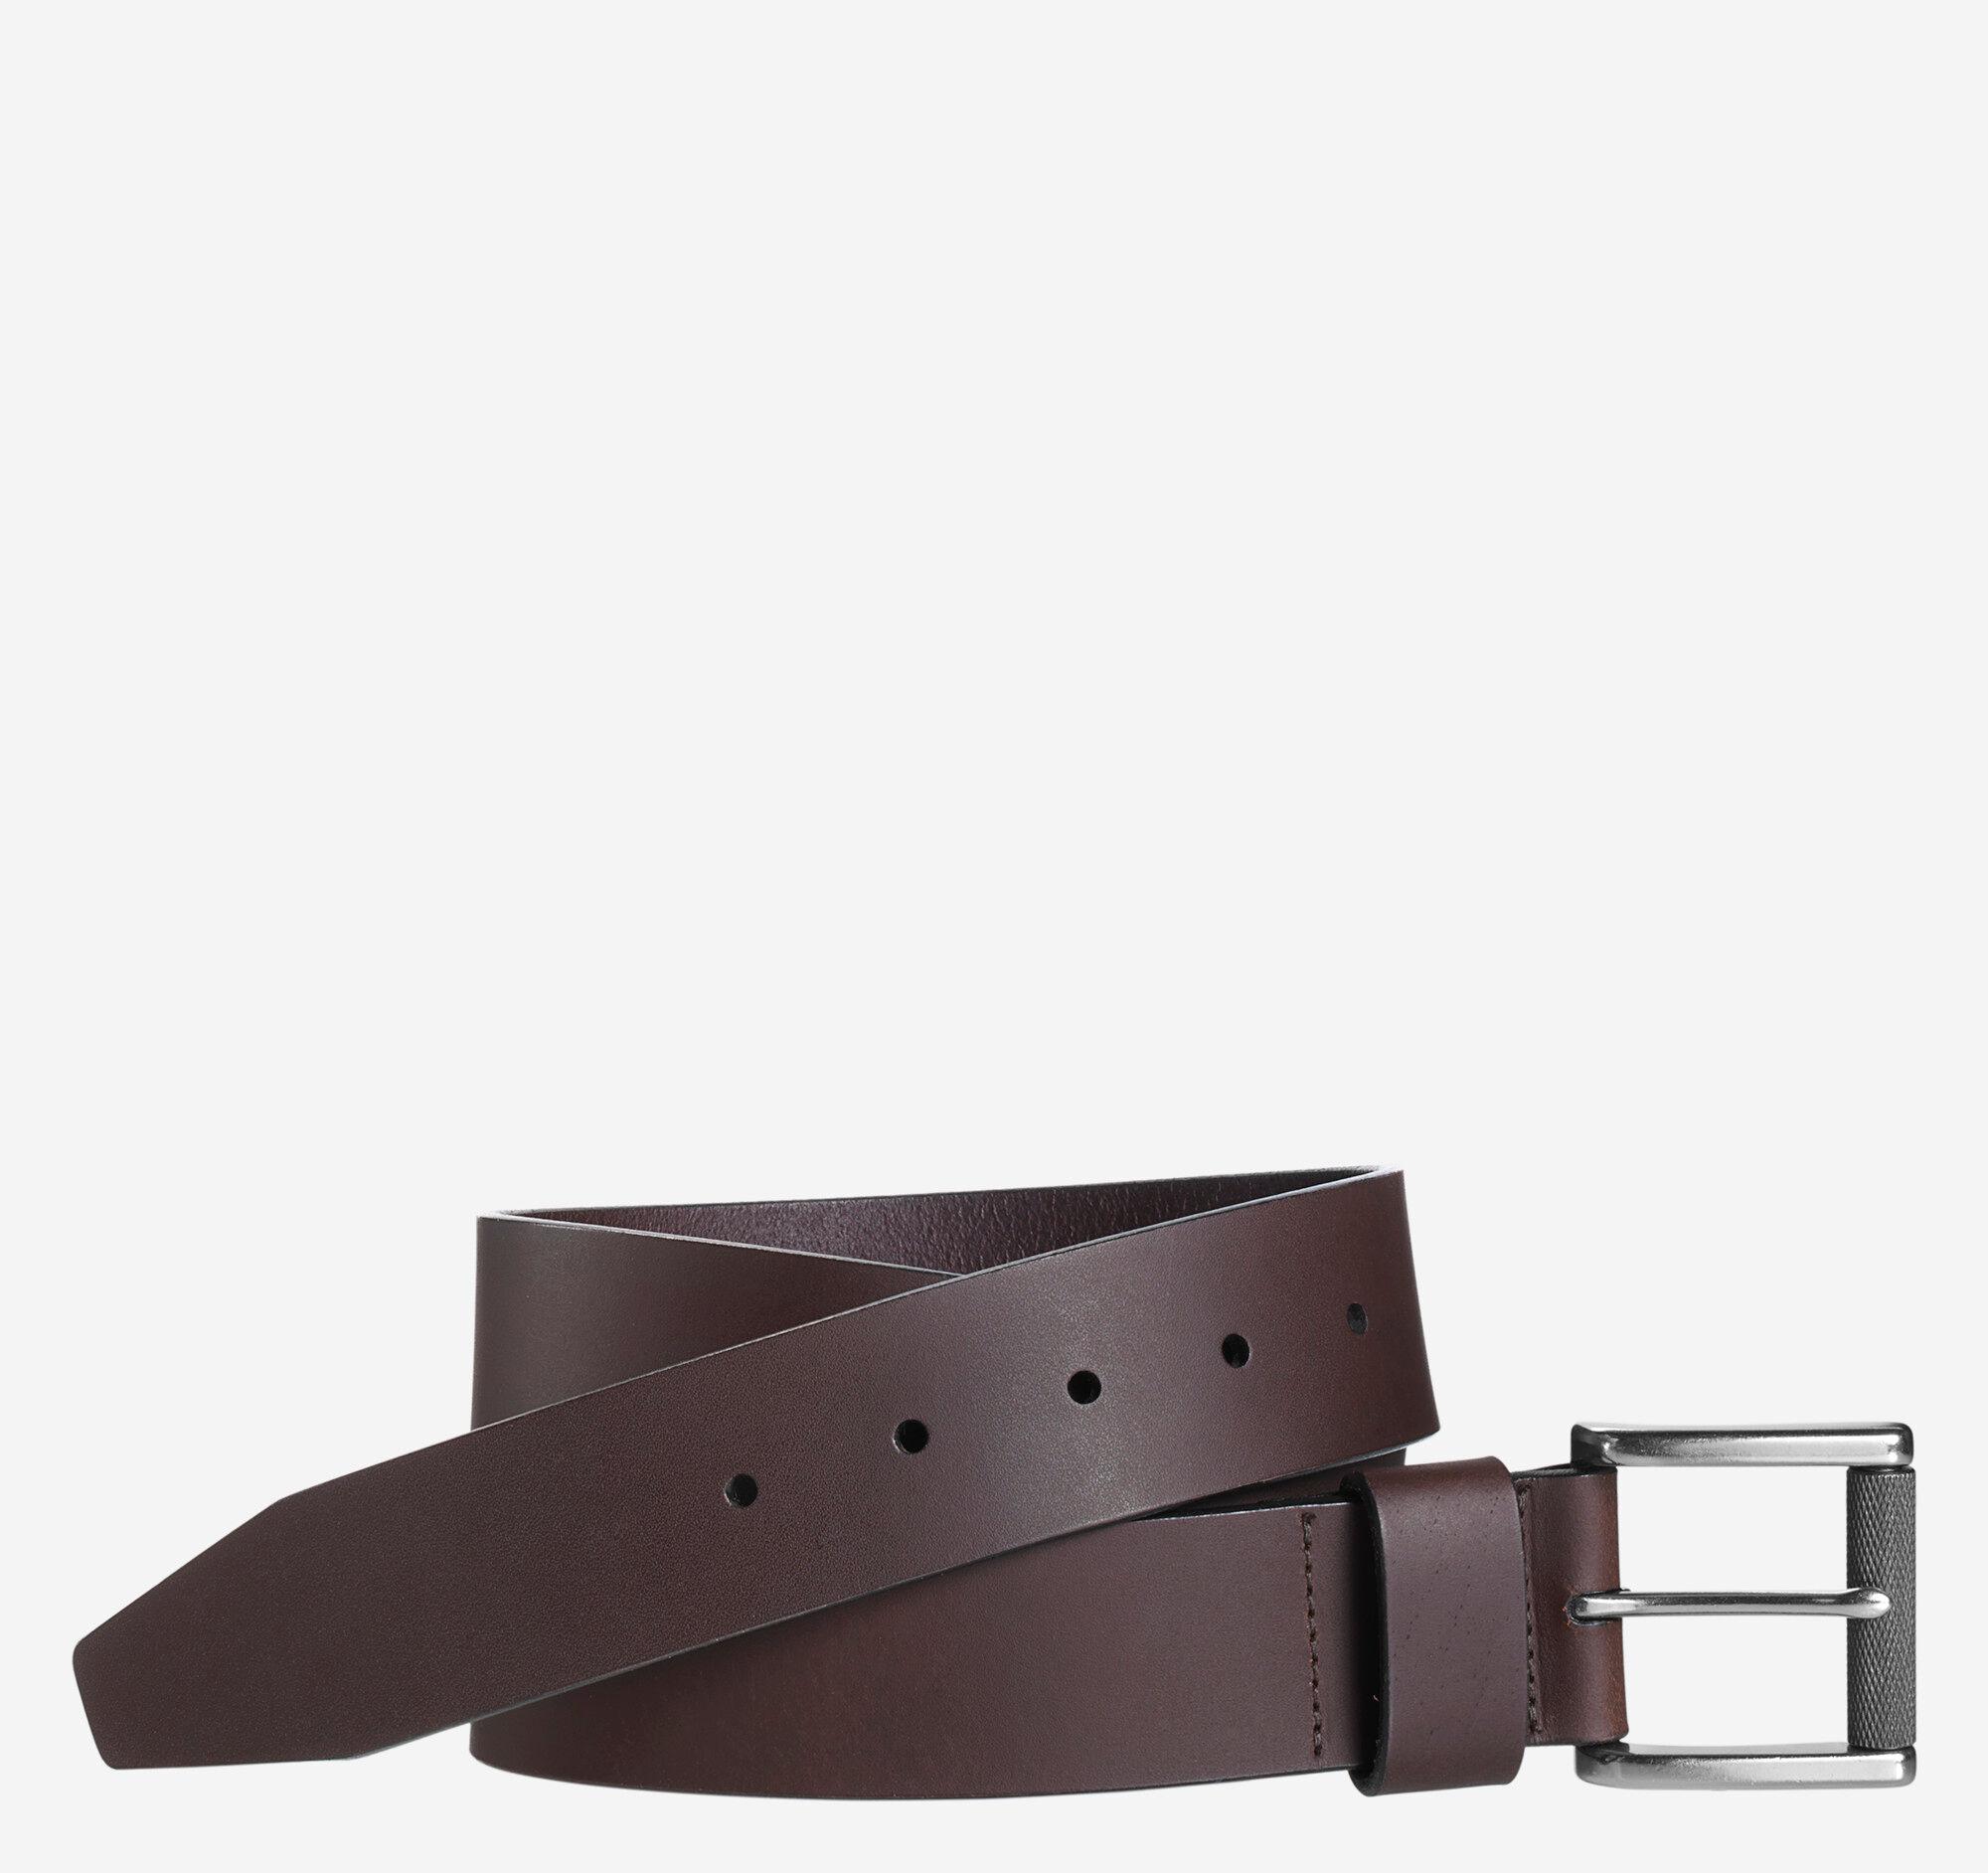 Johnston & Murphy Men's Roller Buckle Belt - Brown - Size 34